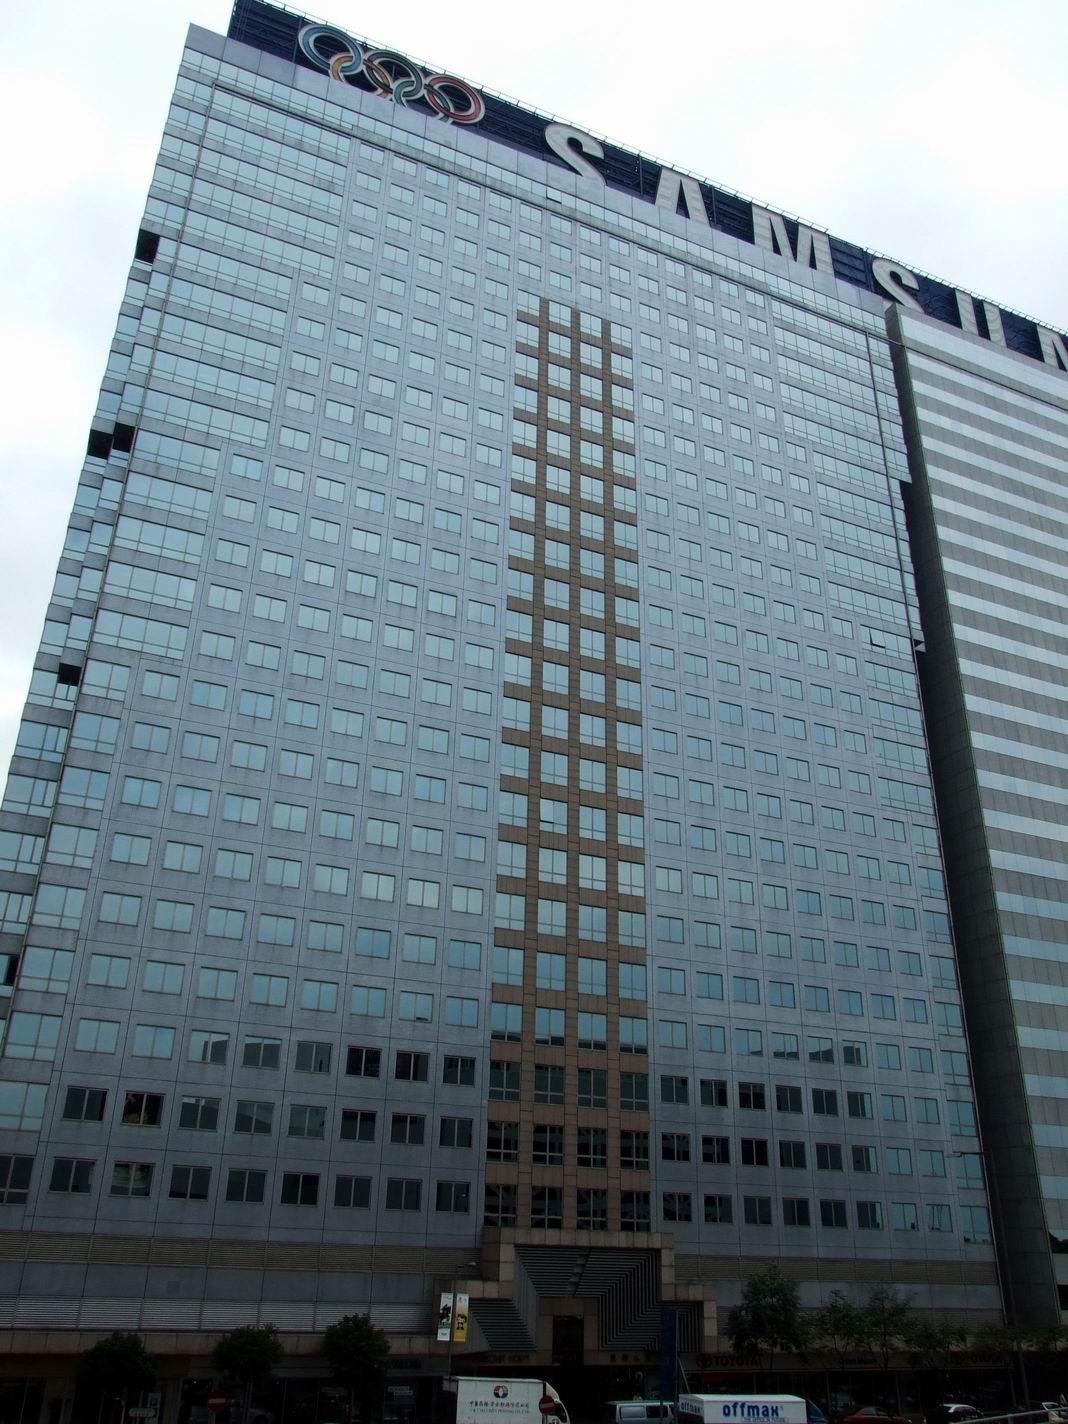 Harcourt House Hong Kong Wikipedia